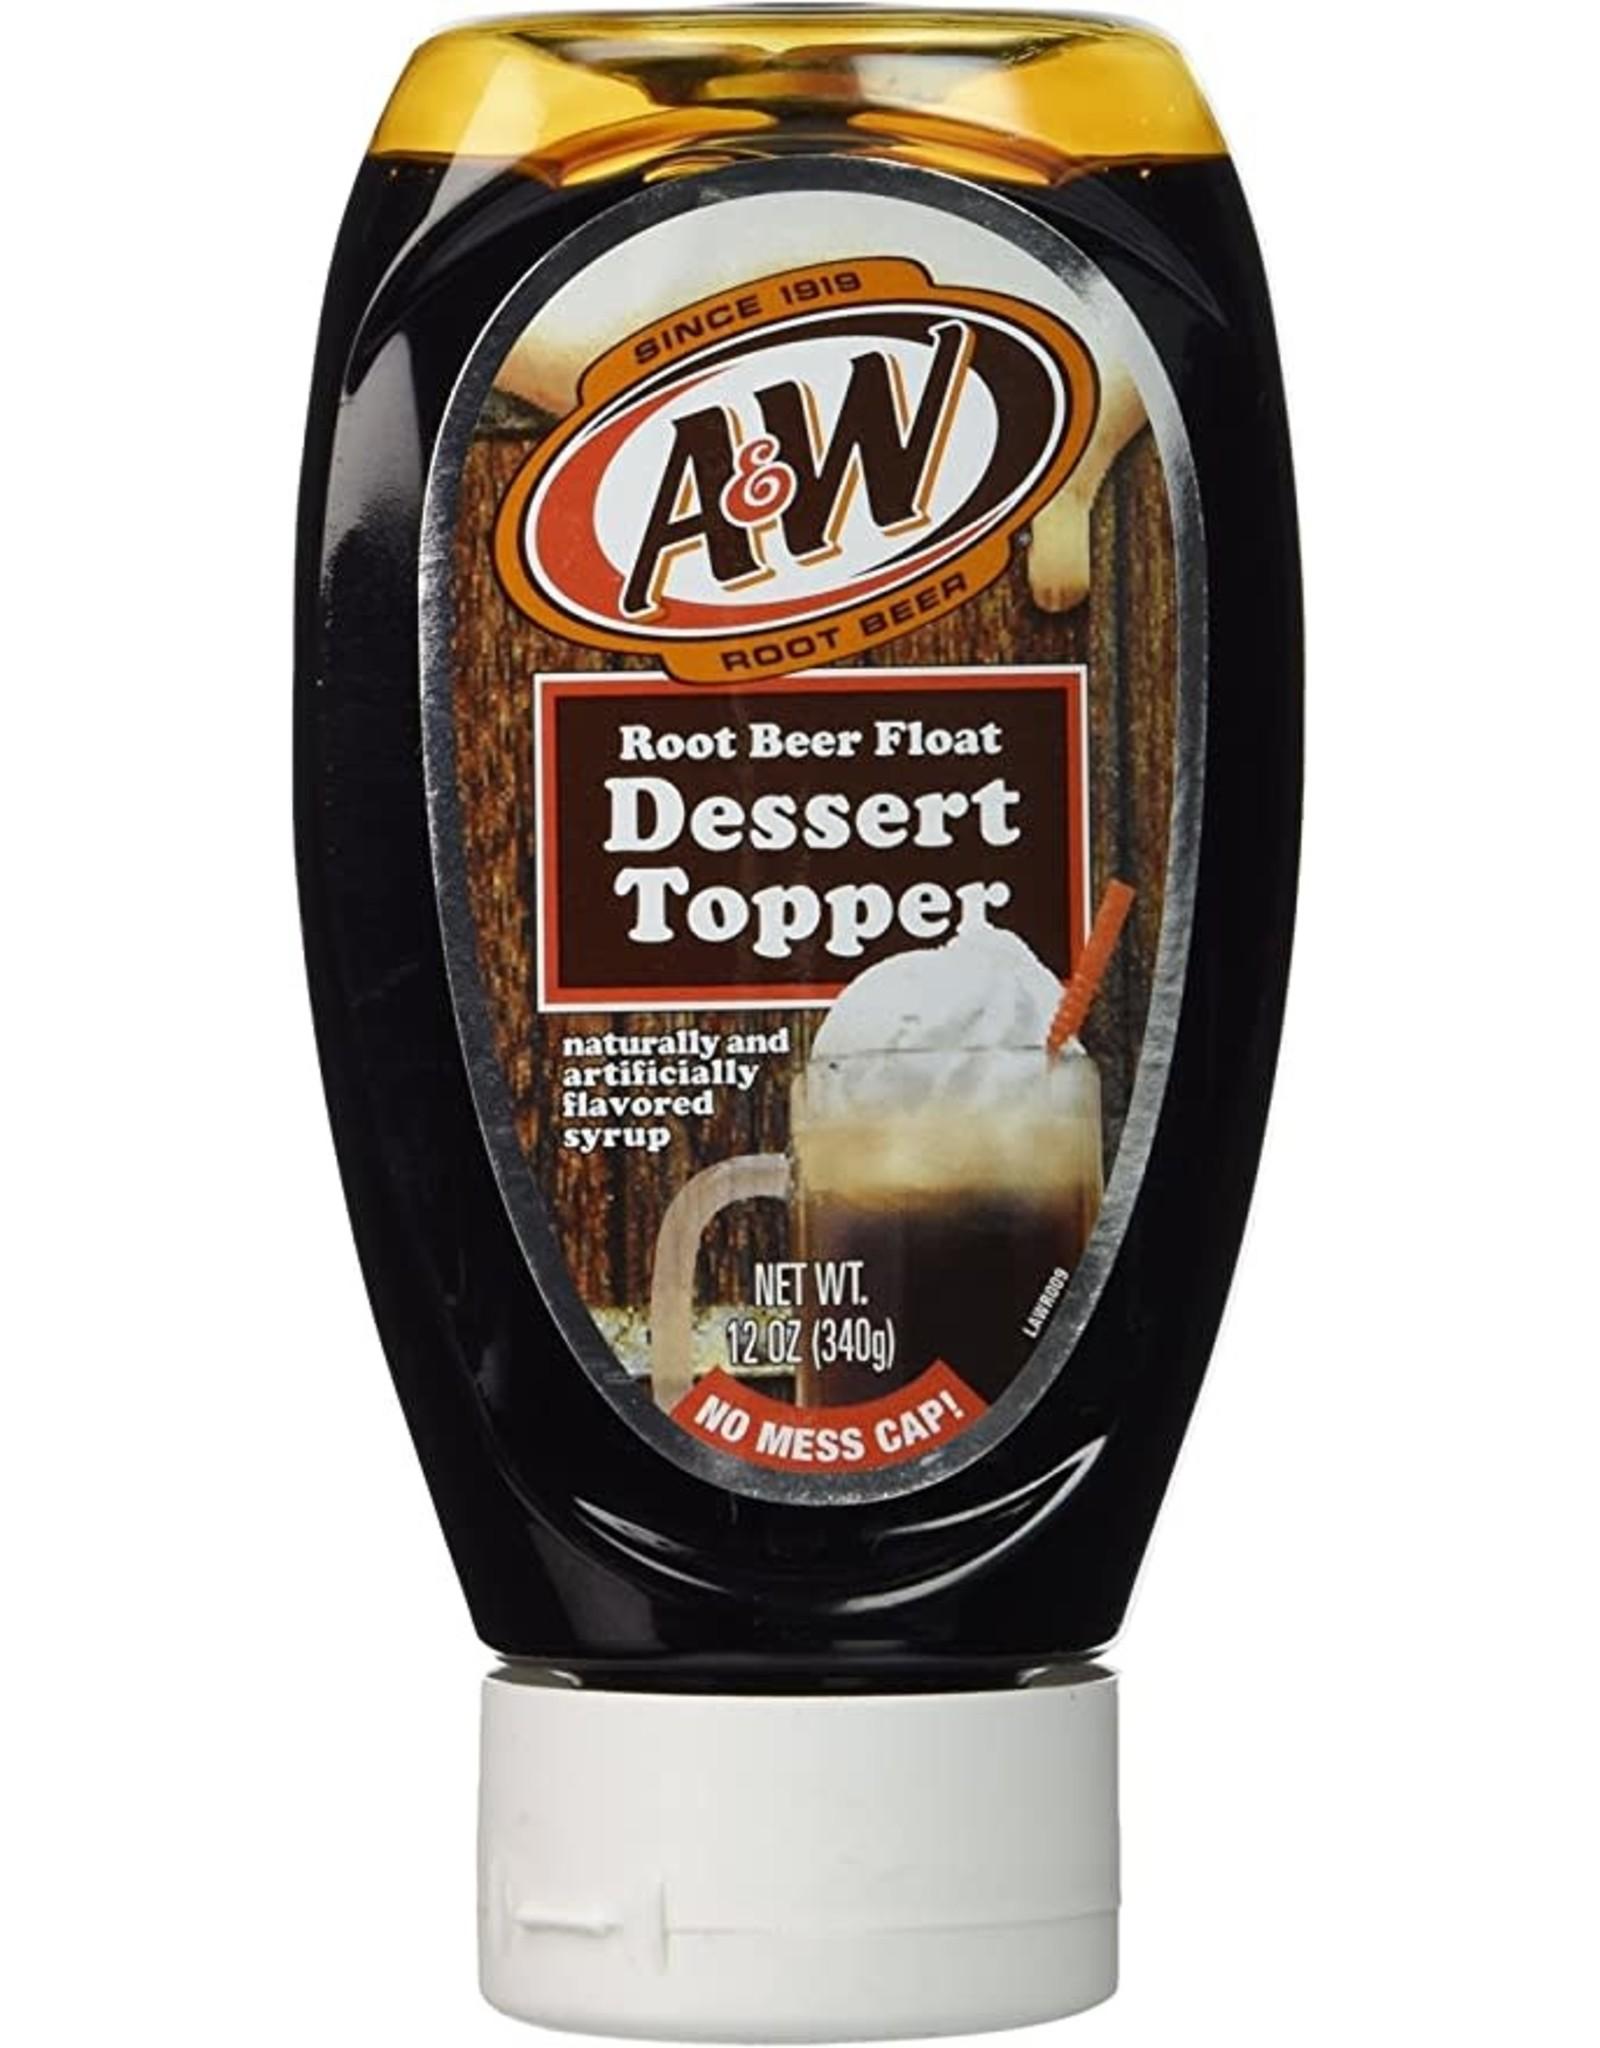 A & W Root Beer Float Dessert Topper - 340 g